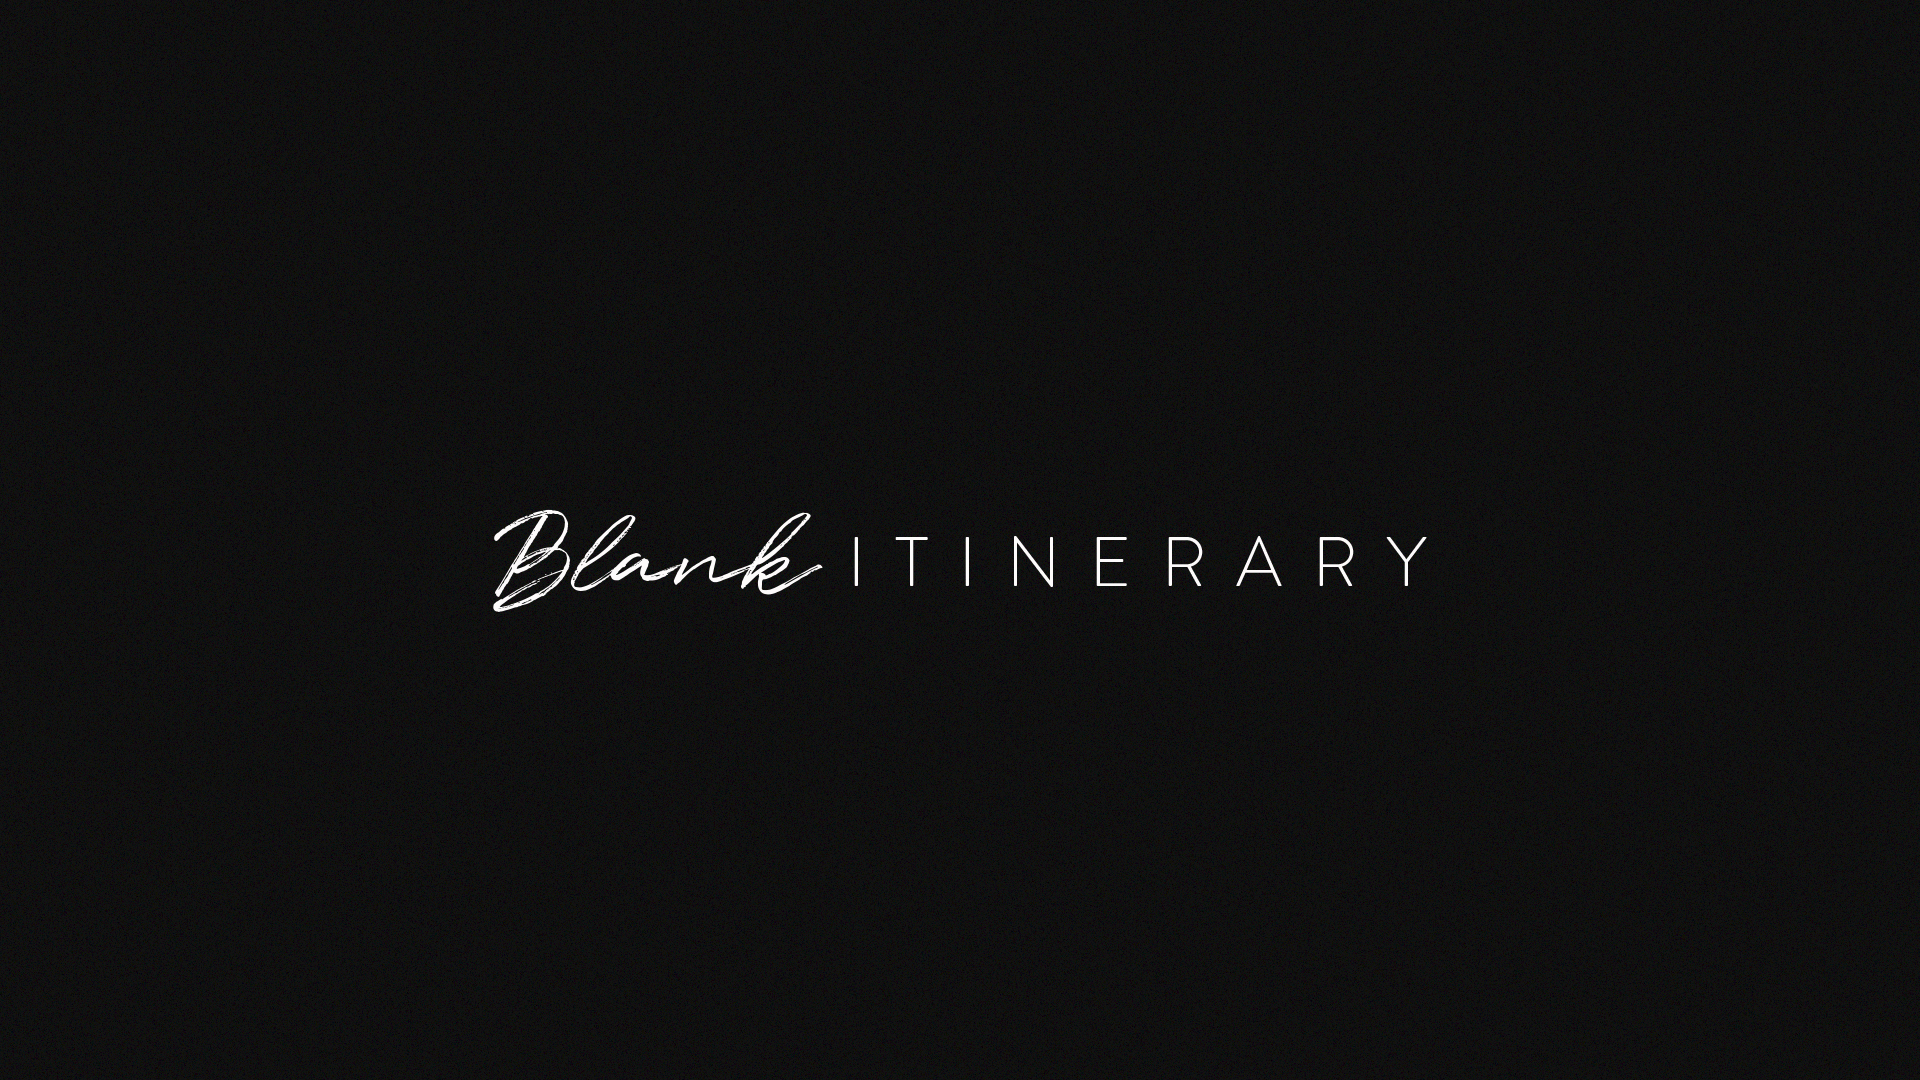 logo-white-blank-itinerary-yoenpaperland